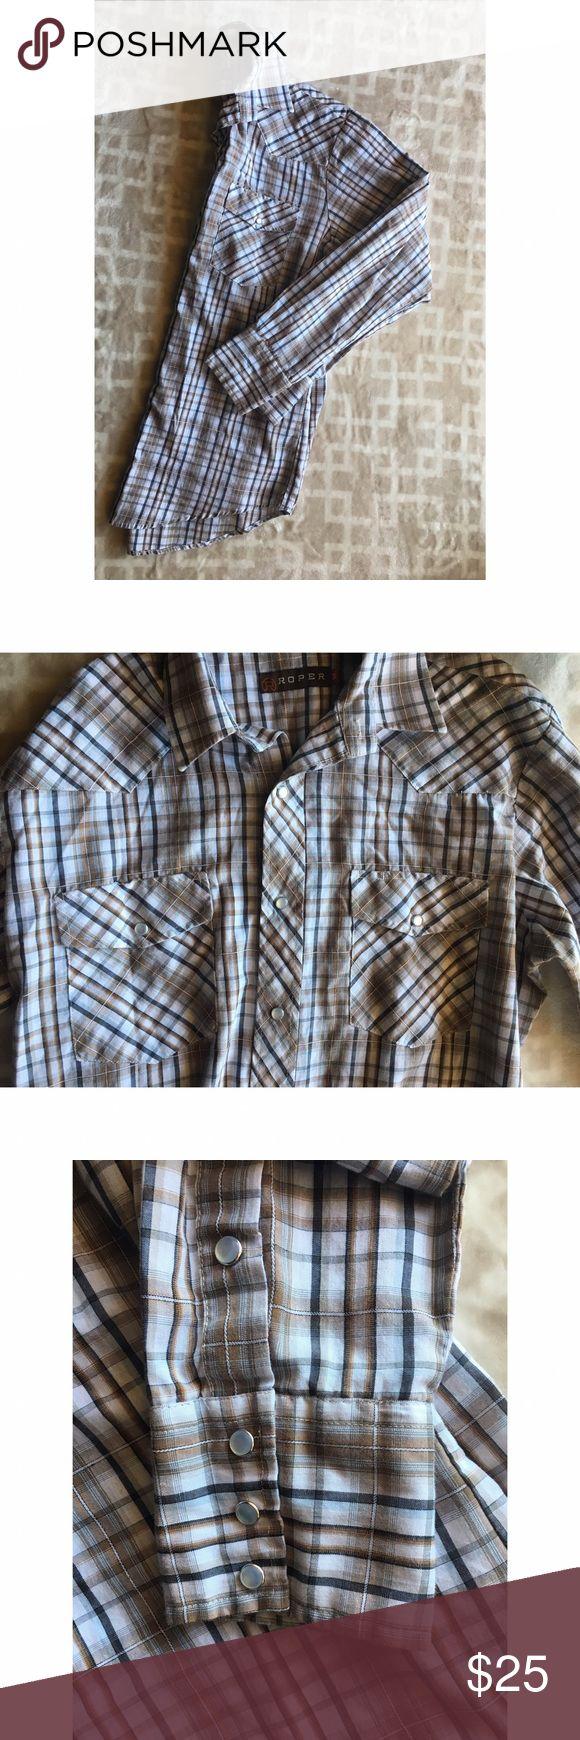 Men's Tan Pearl-Snap Plaid Shirt Tan and Cream Pearl-Snap Long-Sleeve. Great Condition! Roper Shirts Casual Button Down Shirts